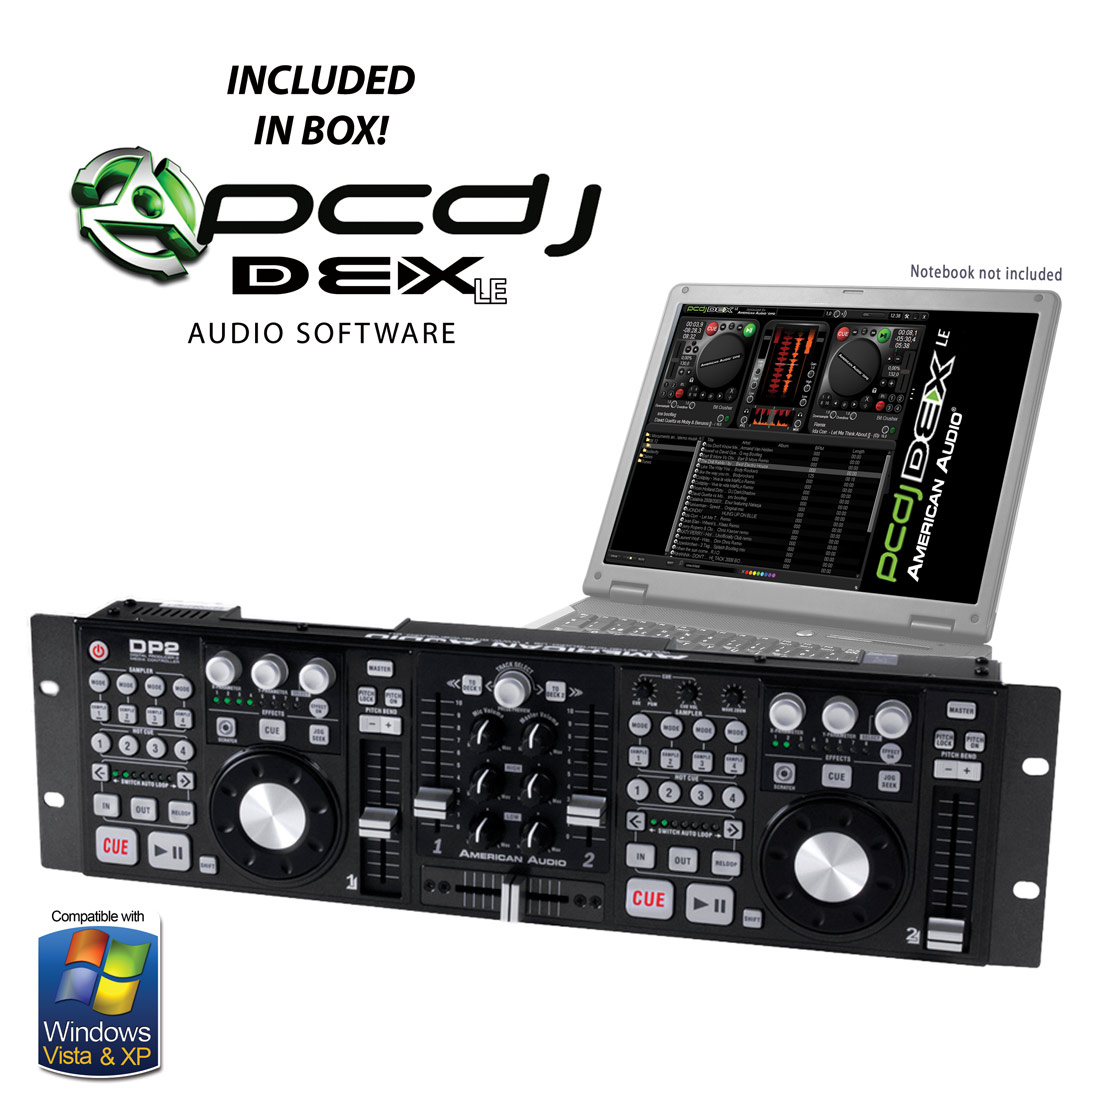 DP 2 USB controller + PCDJ Software